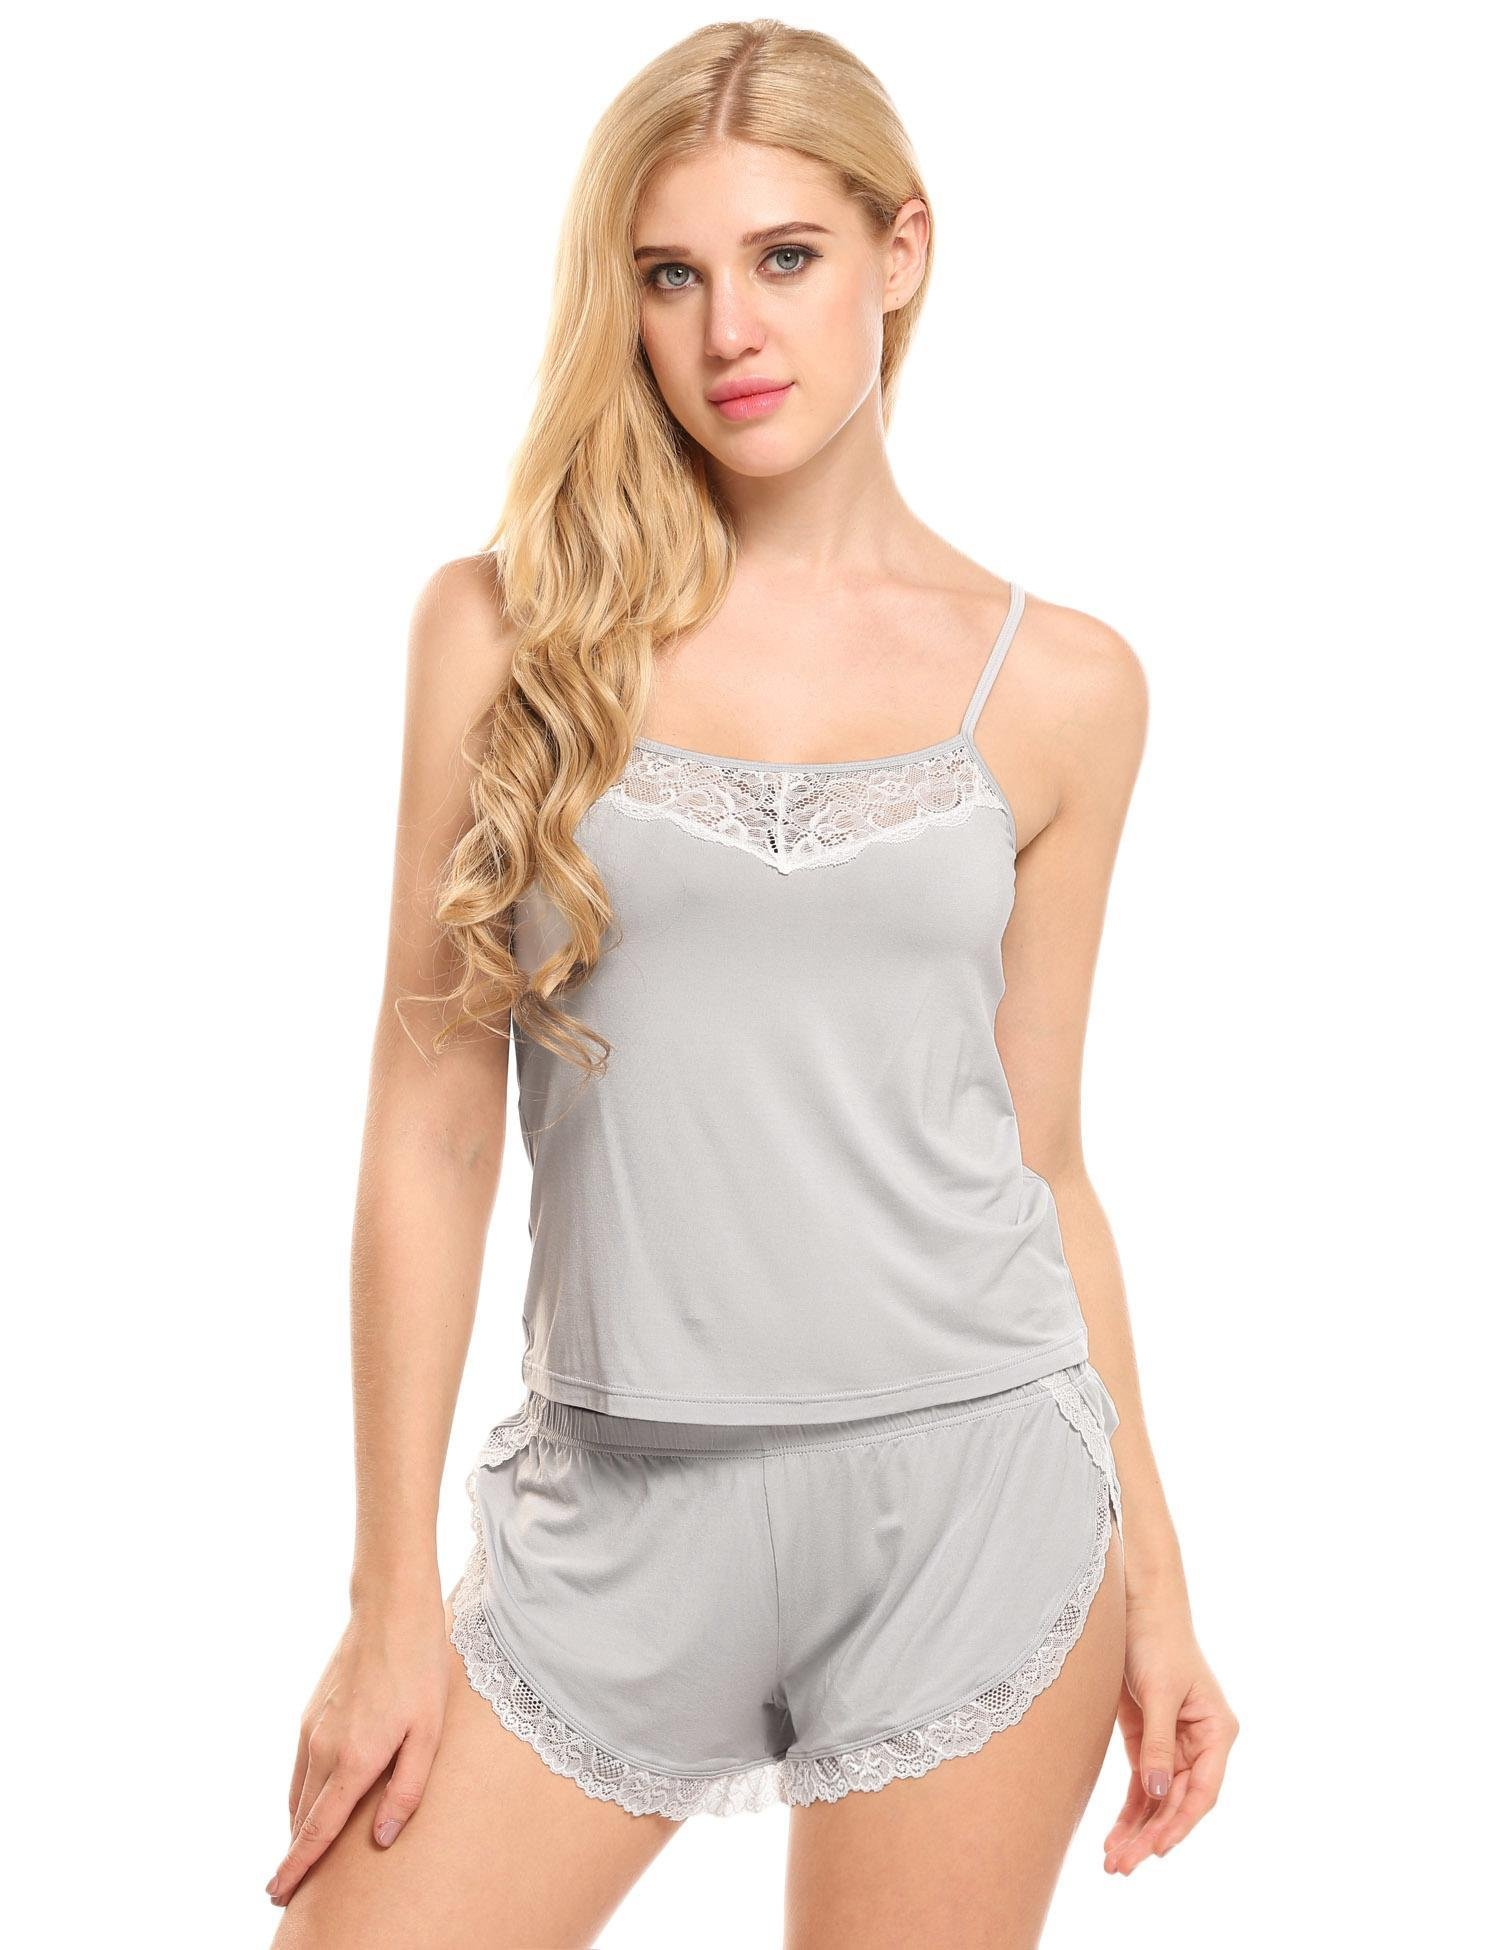 Ekouaer Women Pajamas Sexy Short Sets Lace Camisole Lingerie Sleepwear (Grey, L)